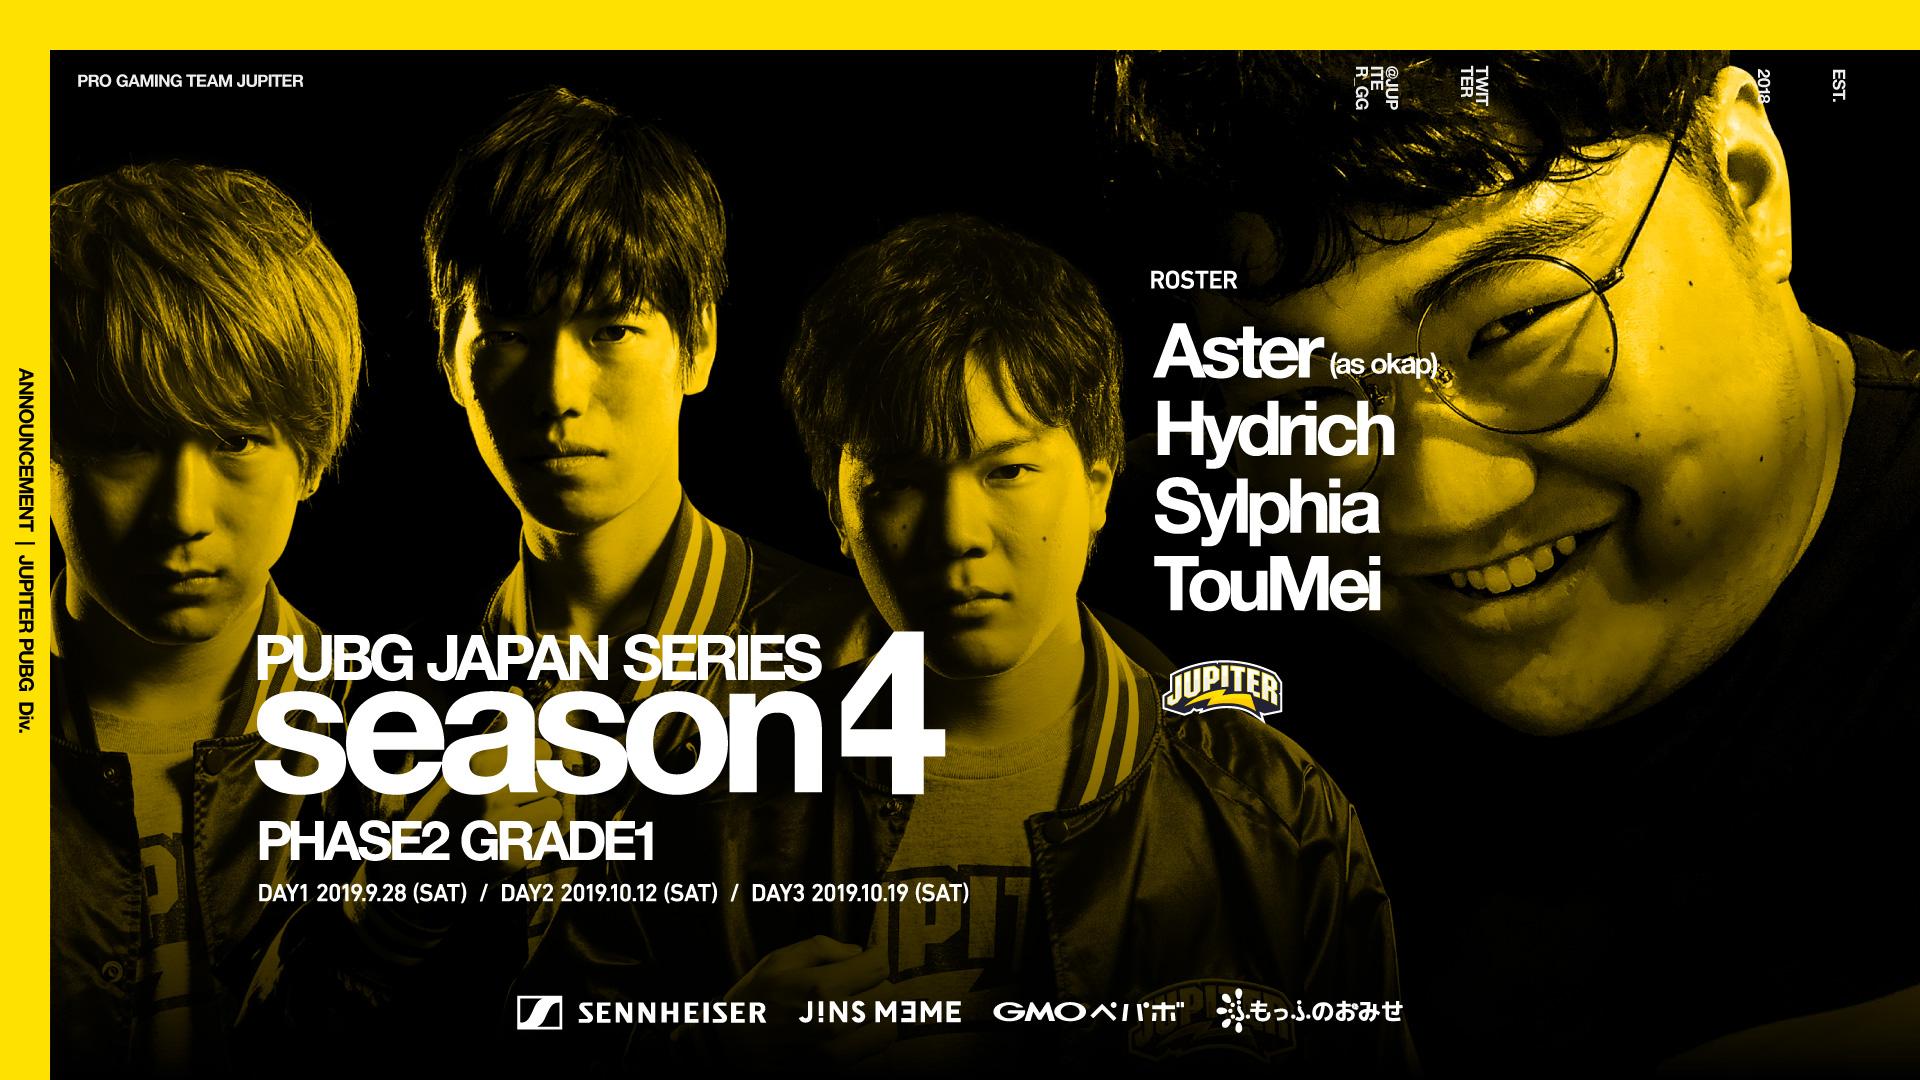 JUPITER NOVA – PUBG JAPAN SERIES 2019 Season4 Phase1 Grade2 結果報告 See below for the English News